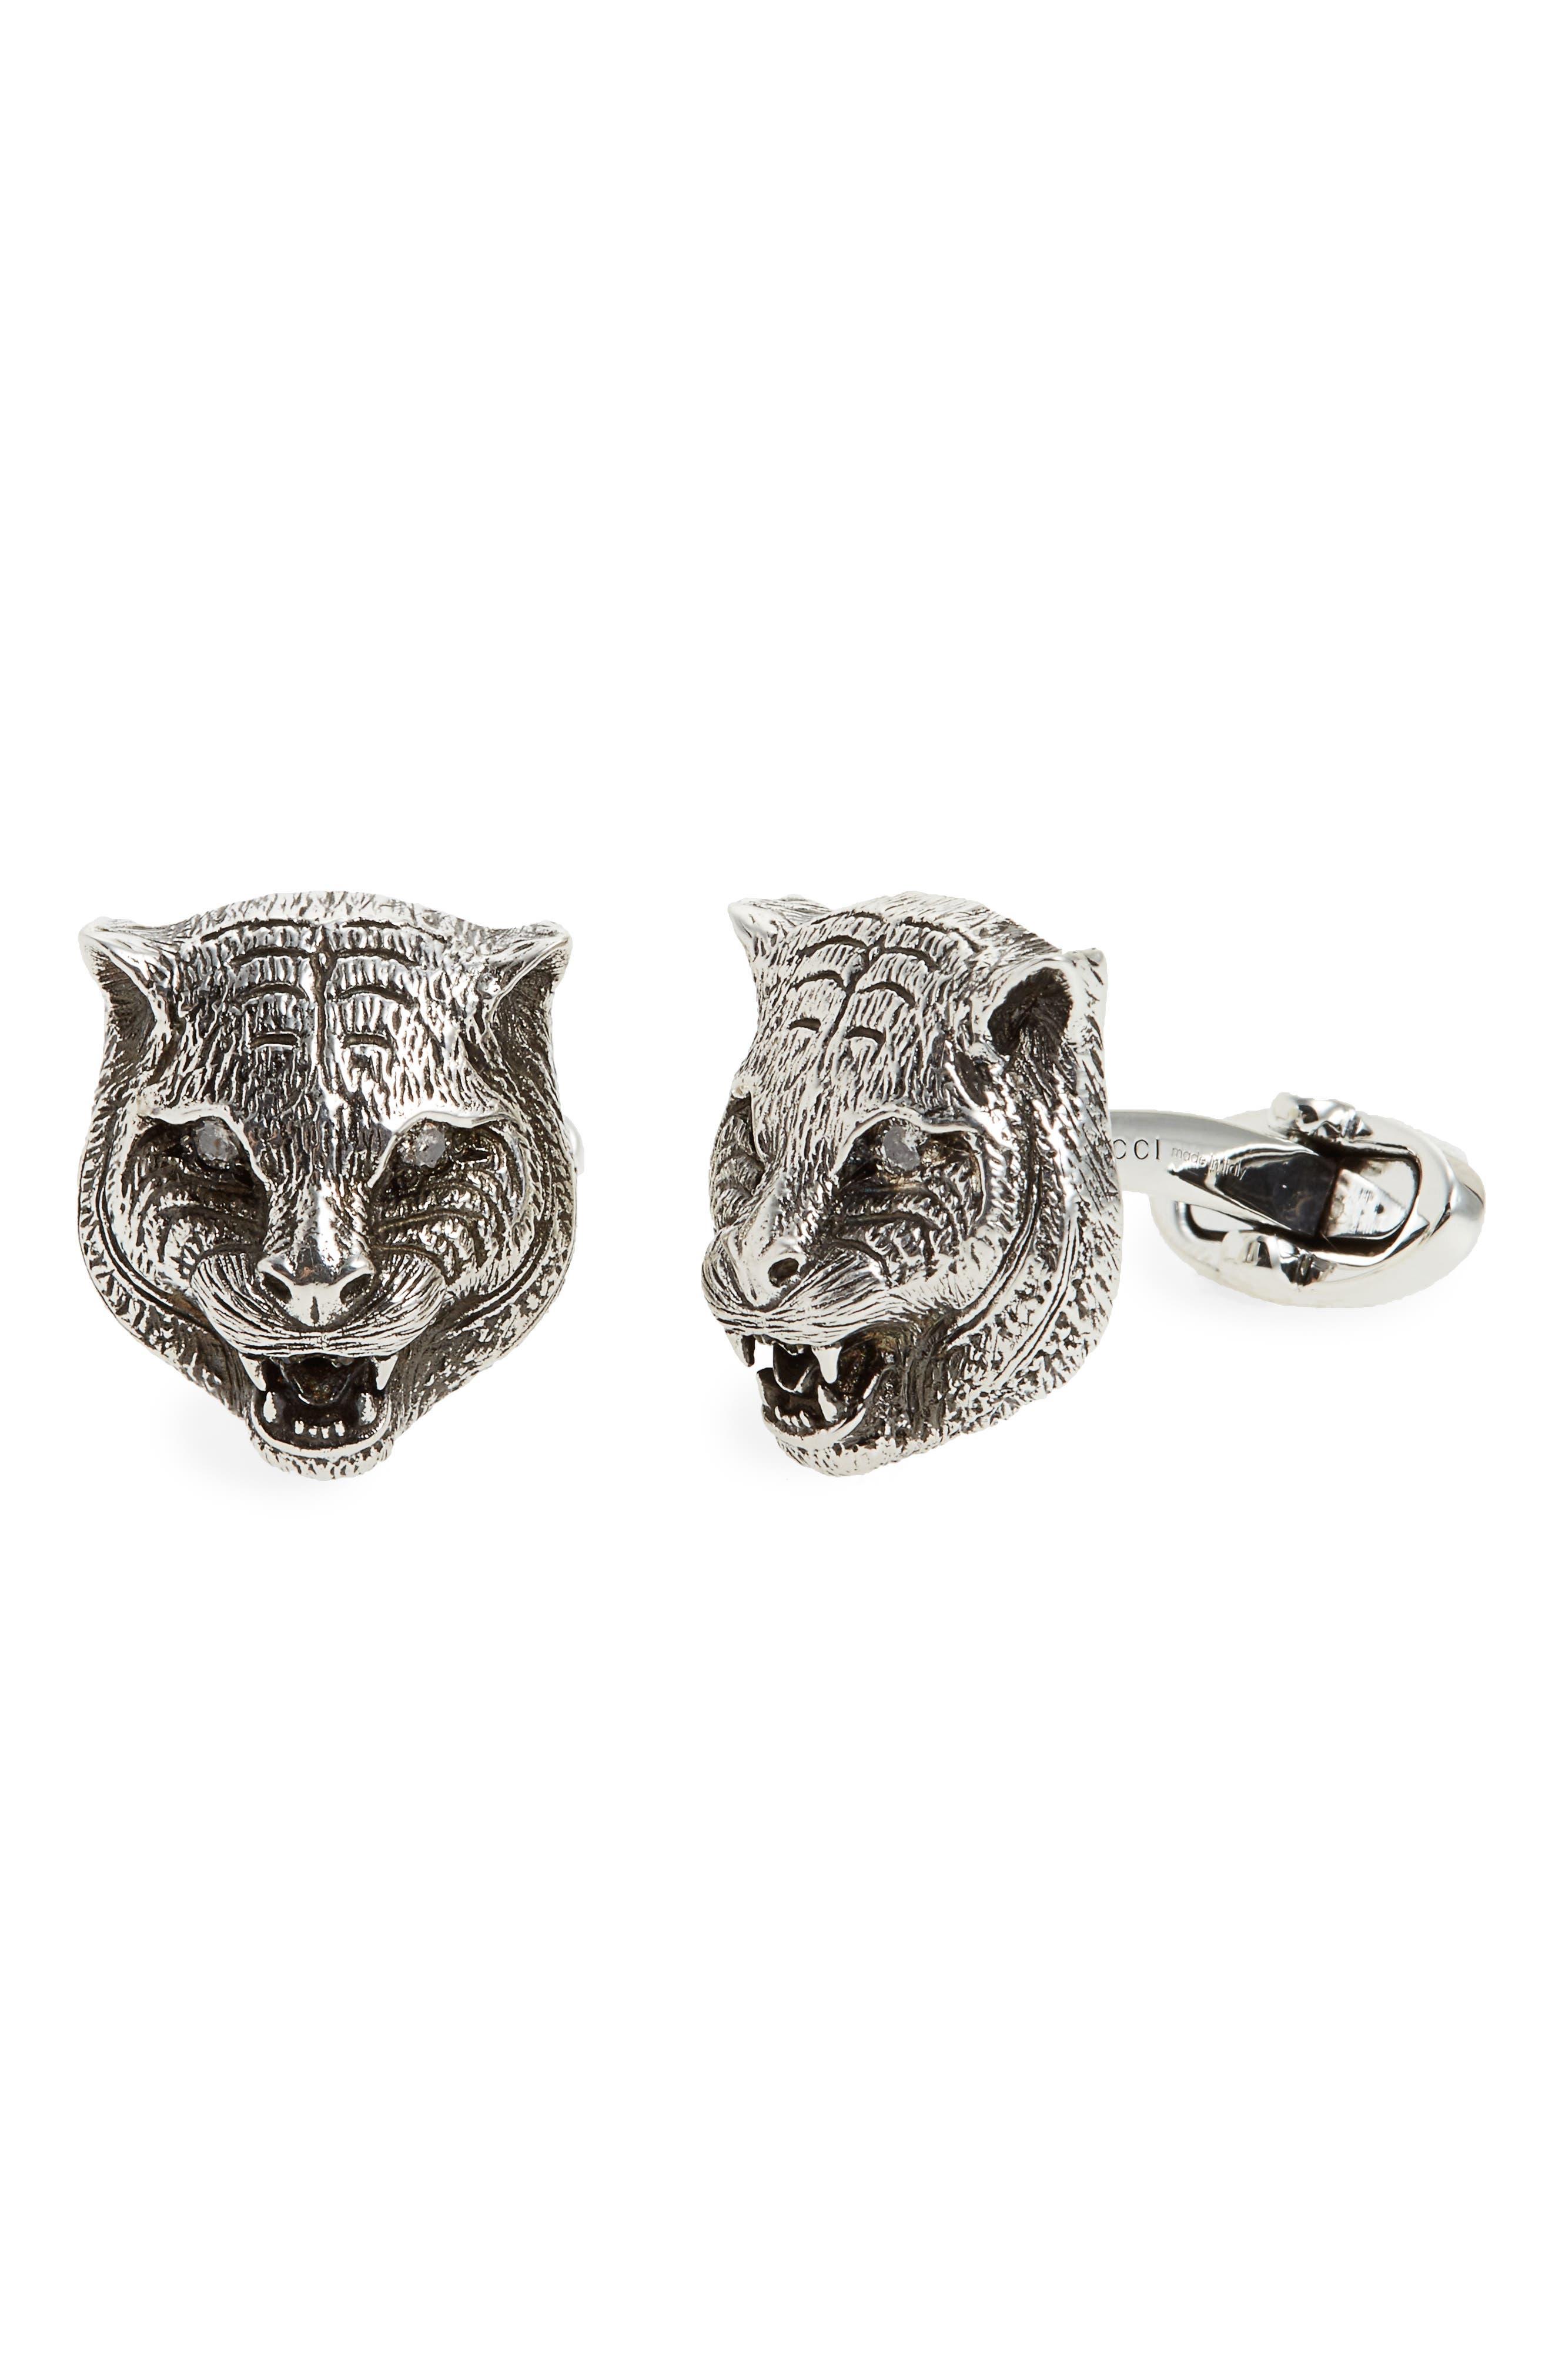 Main Image - Gucci Garden Wolf Cuff Links